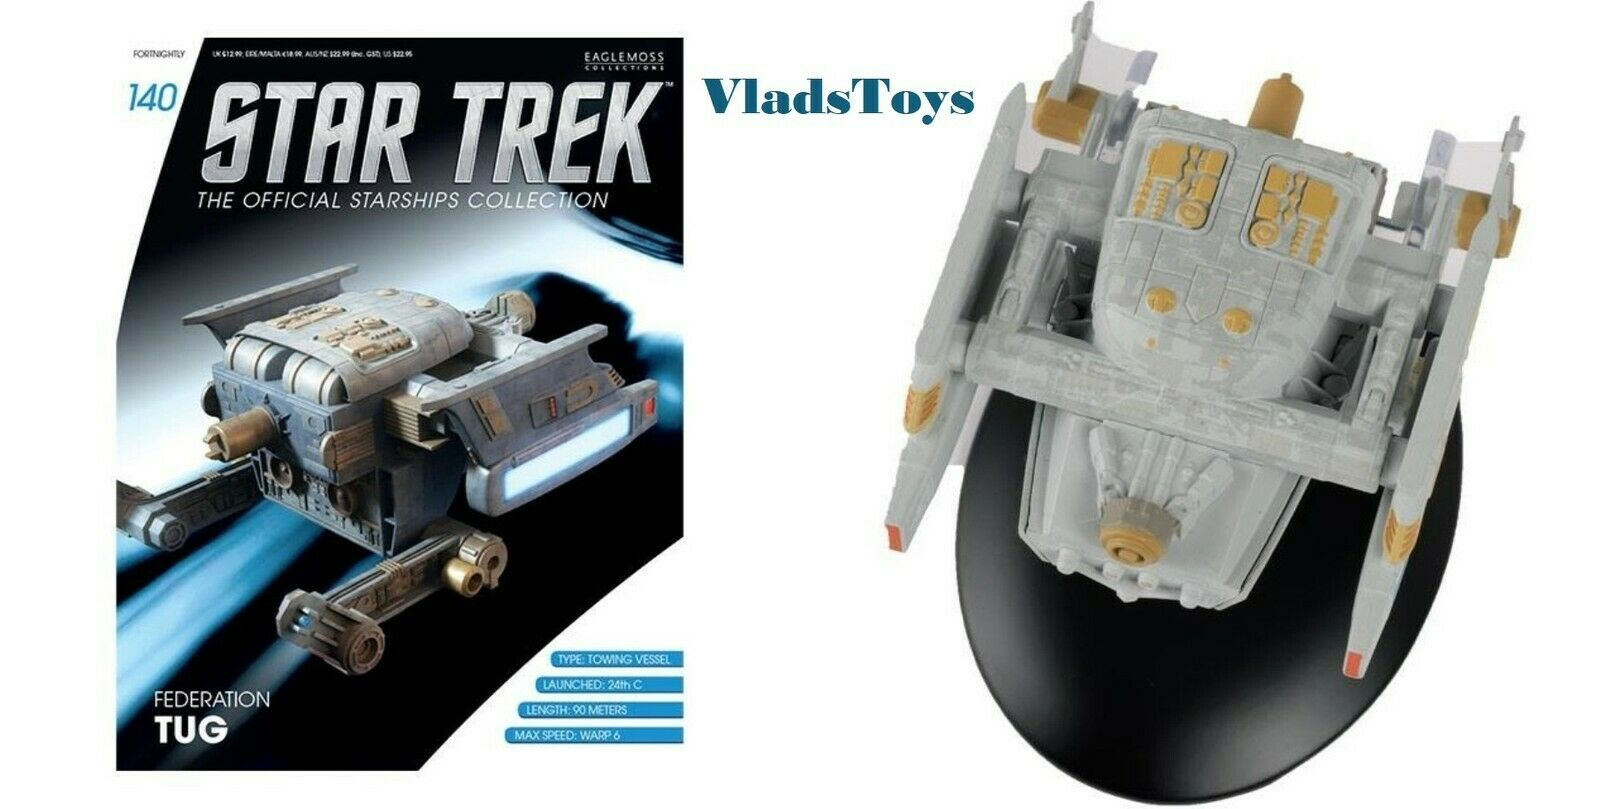 Starfleet Federation Federation Federation Tug Star Trek Eaglemoss w Magazine Iusse 44e9da